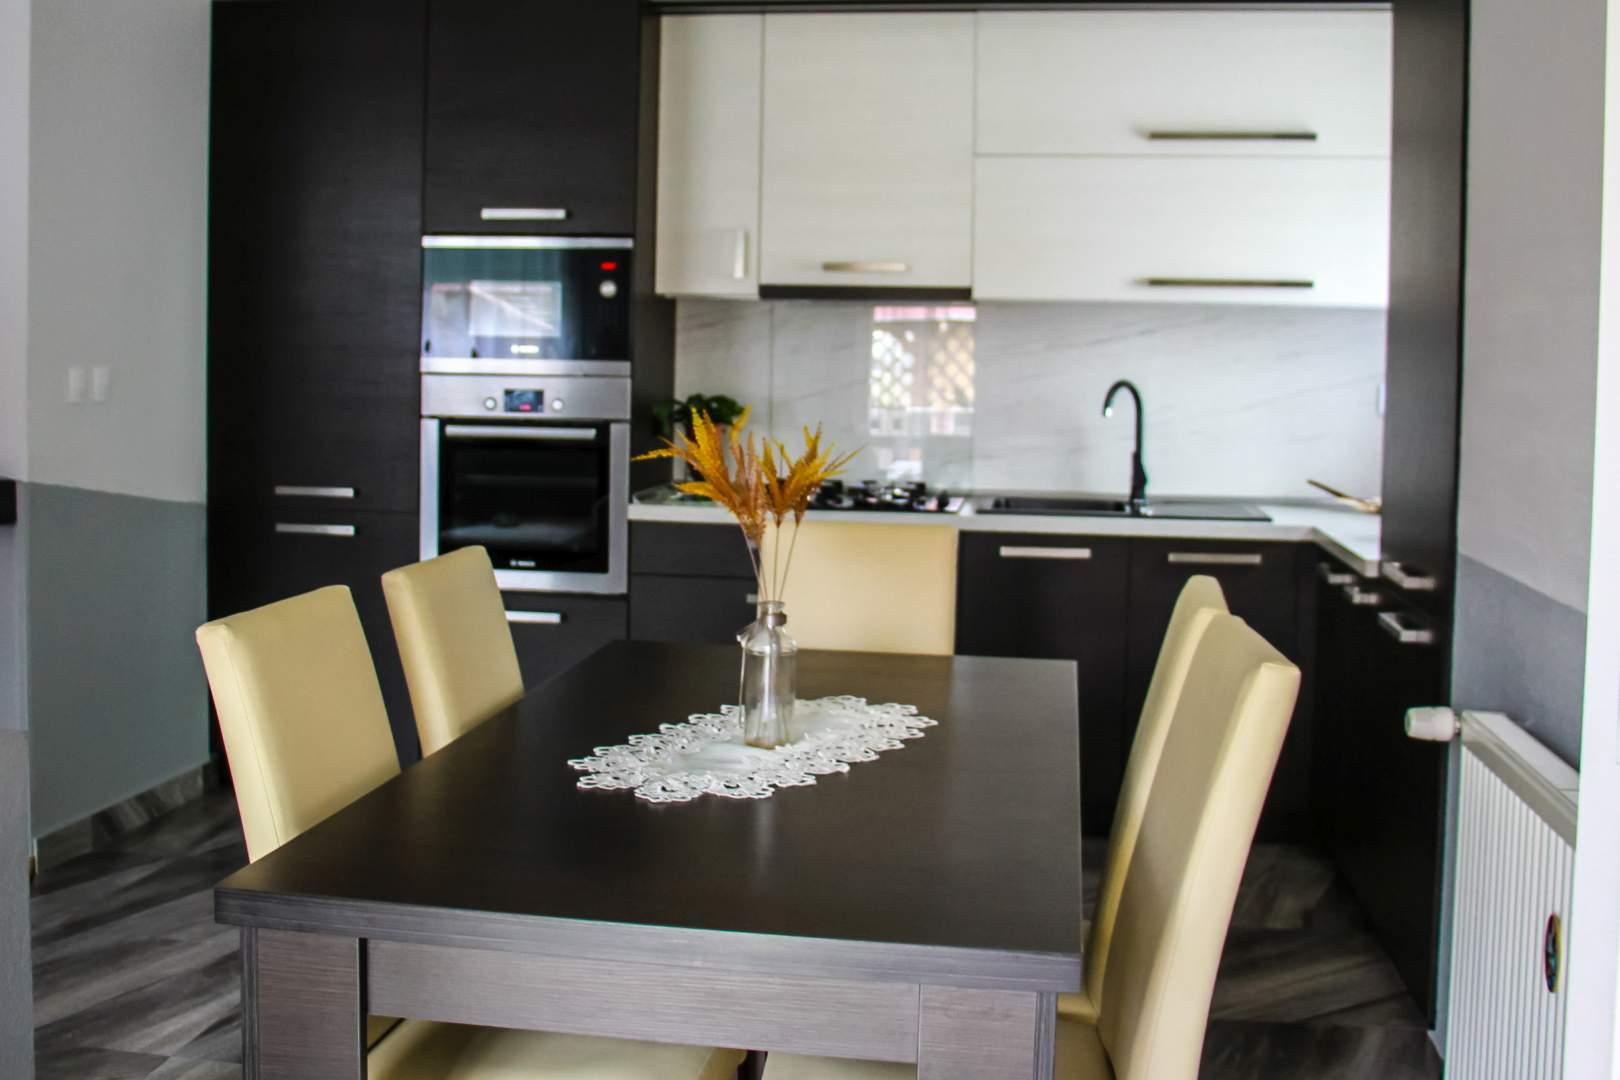 Nábytok na mieru - vybavenie obývacích izieb, detských izieb, predsiení, šatní aj spální.